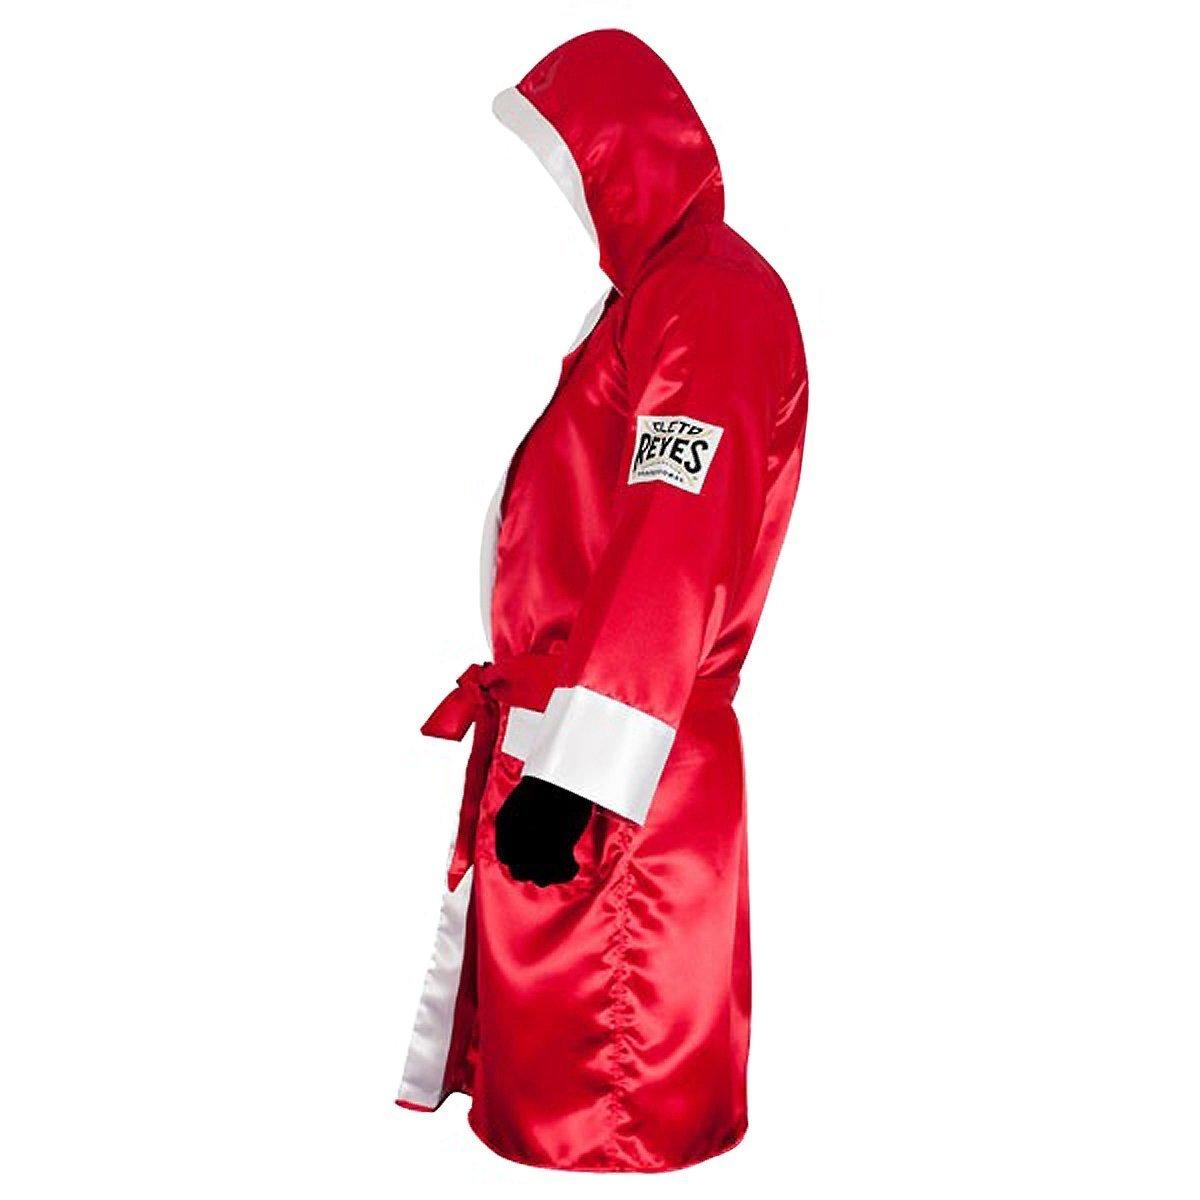 1054623cca Cleto Reyes Satin Boxing Robe with Hood - Black Gold  1541594622 ...